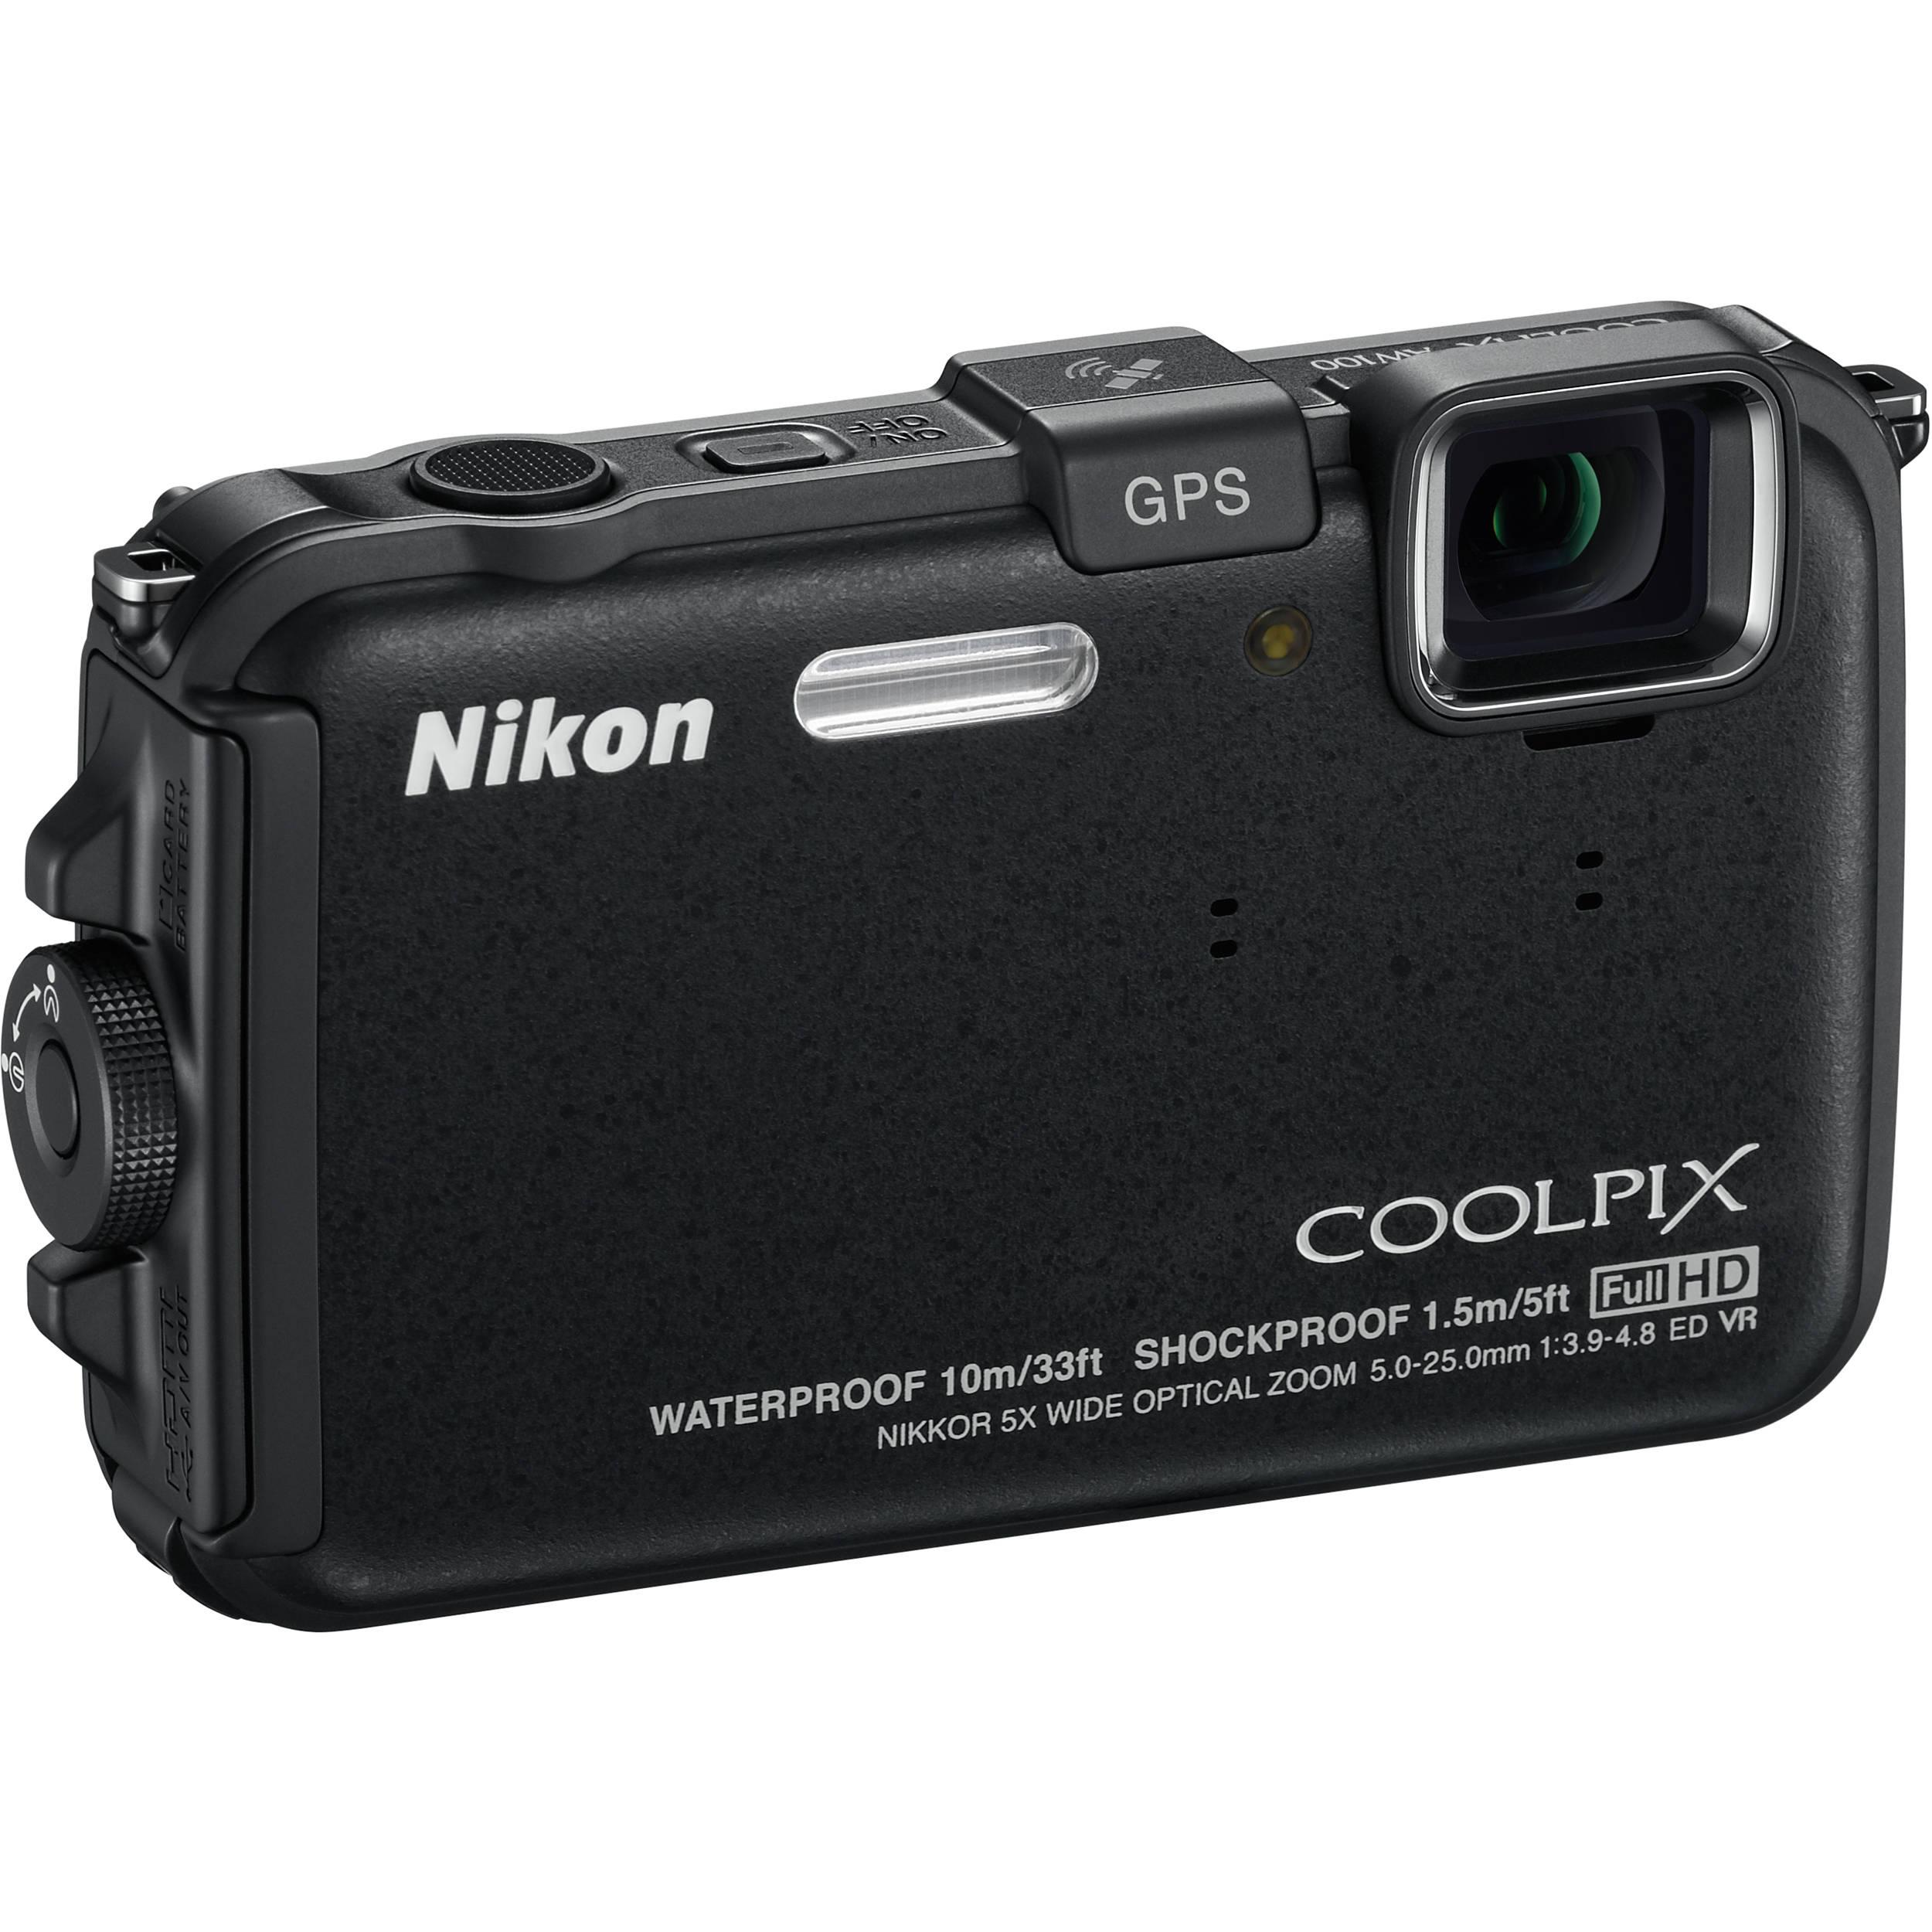 nikon coolpix aw100 waterproof digital camera black 26290 b h rh bhphotovideo com Nikon Coolpix Aw130 nikon coolpix aw100 user manual